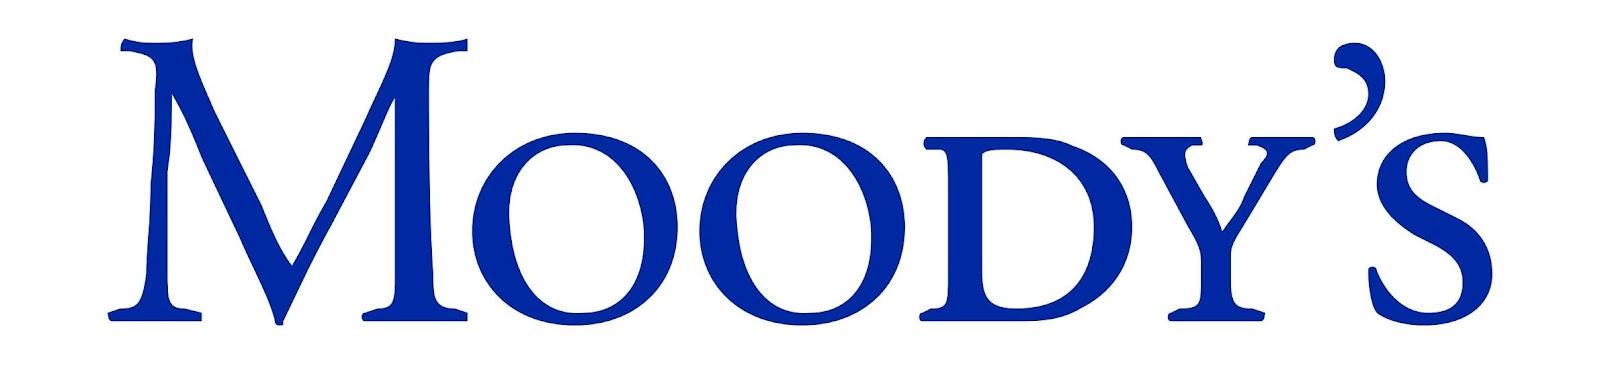 http://4.bp.blogspot.com/-srHsDjMz04I/UFty2RFMRGI/AAAAAAAAGAk/dsryXQmySzw/s1600/Logo+Moody%27s+Investors+Service.jpg